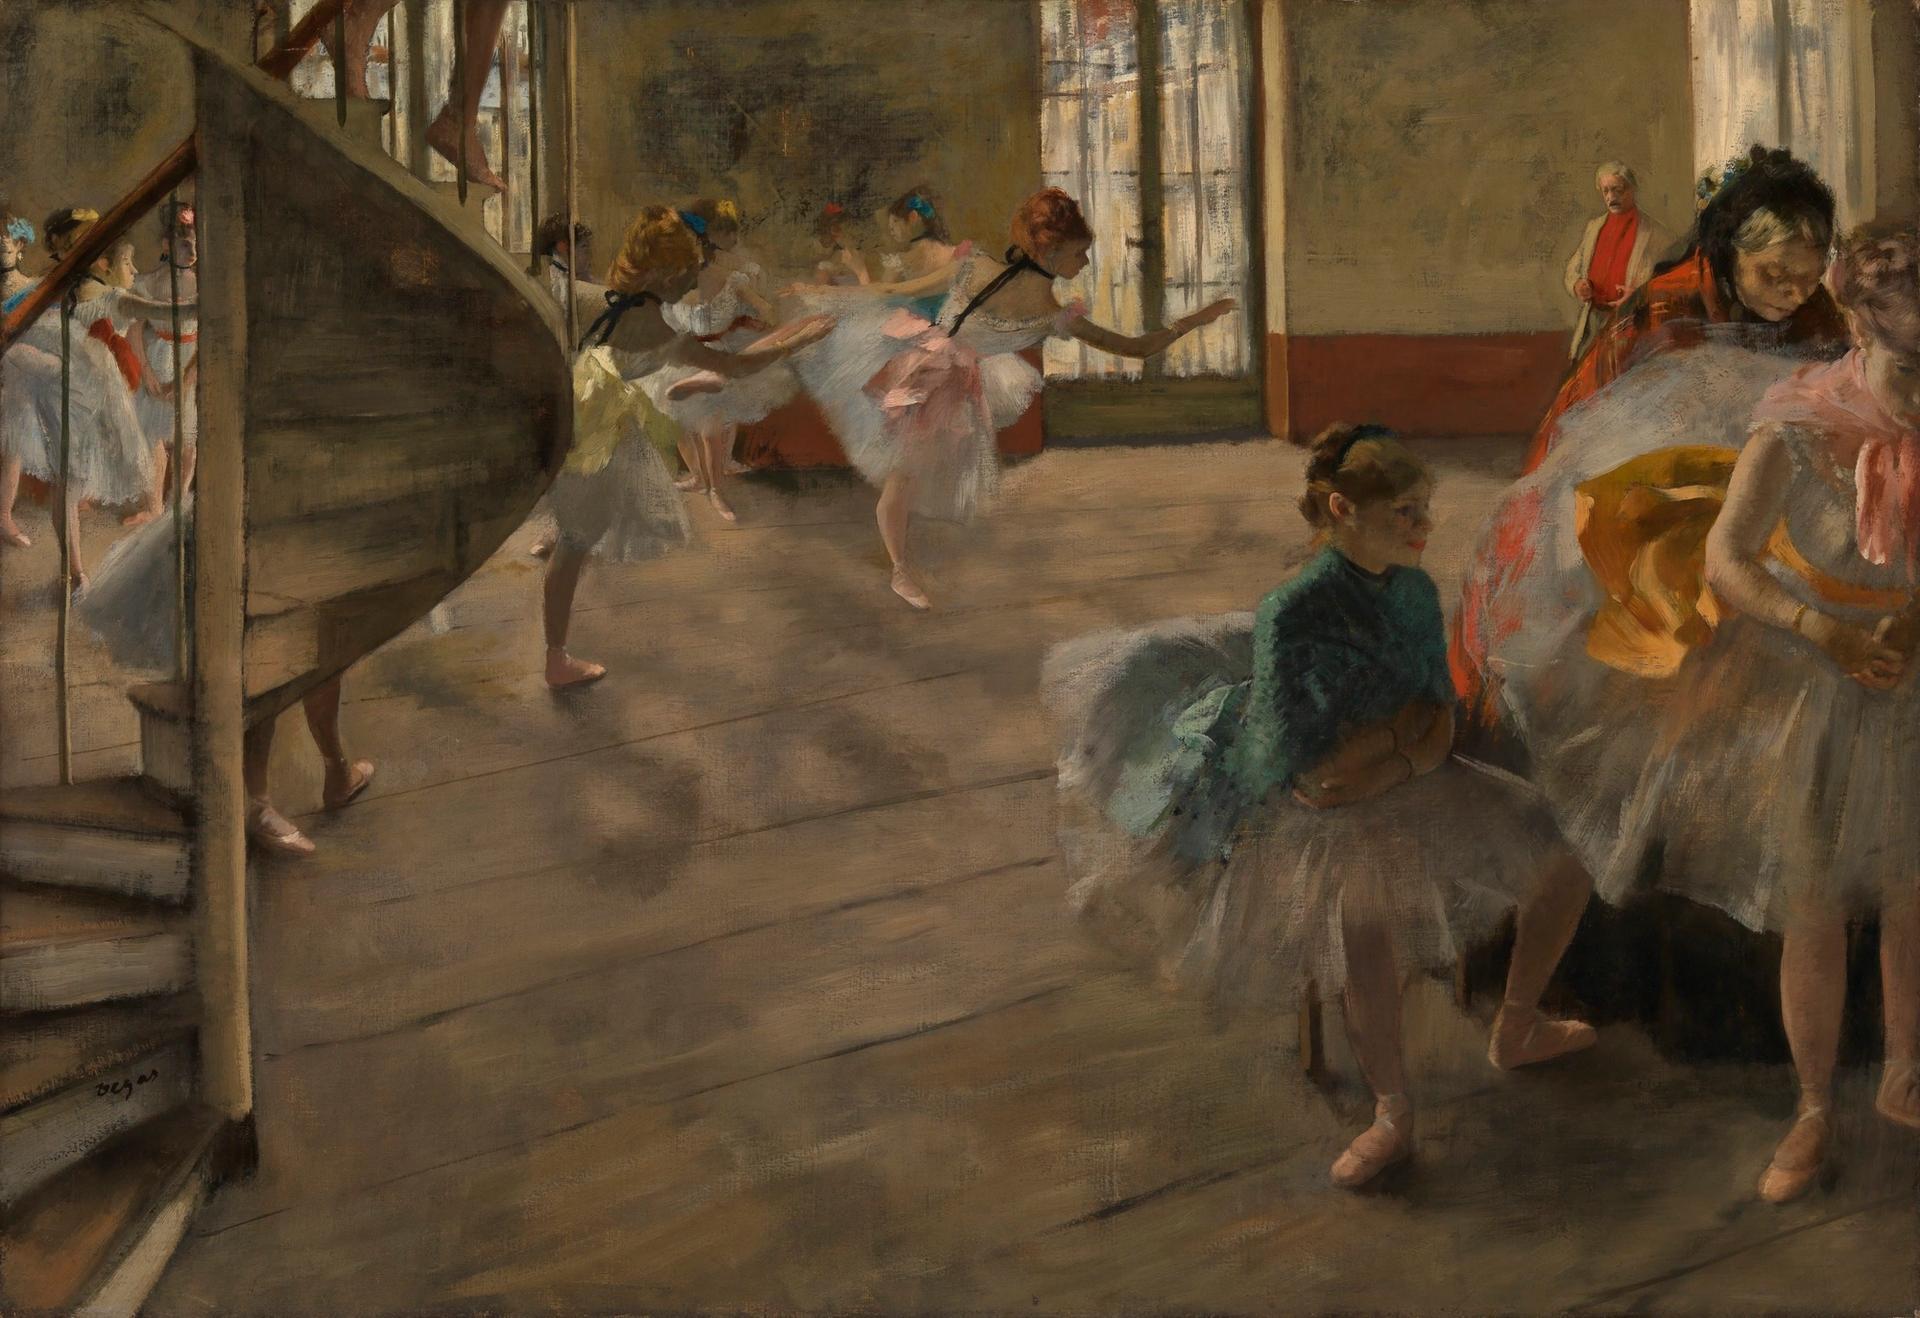 Edgar Degas, The Rehearsal (1874) CSG CIC Glasgow Museums Collection